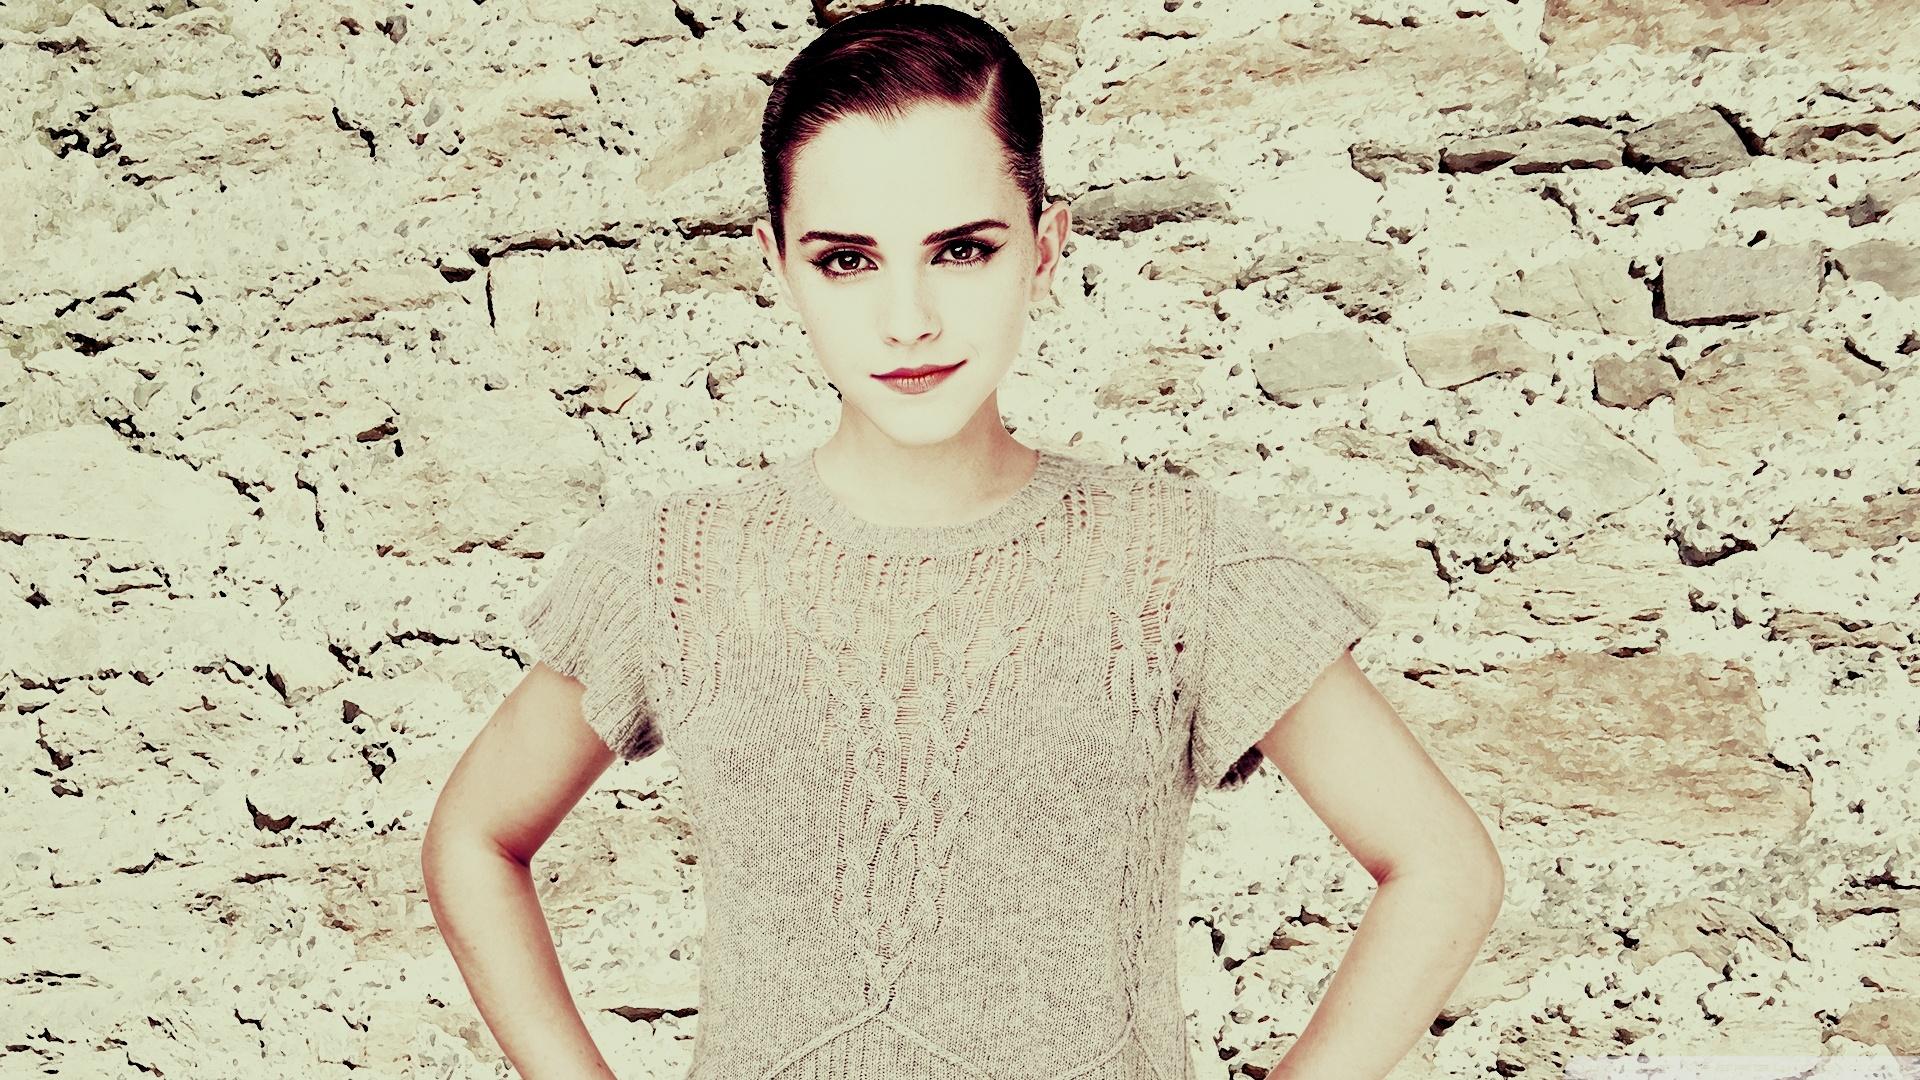 Emma Watson 2015 Wallpaper 19201080 196622 HD Wallpaper Res 1920x1080